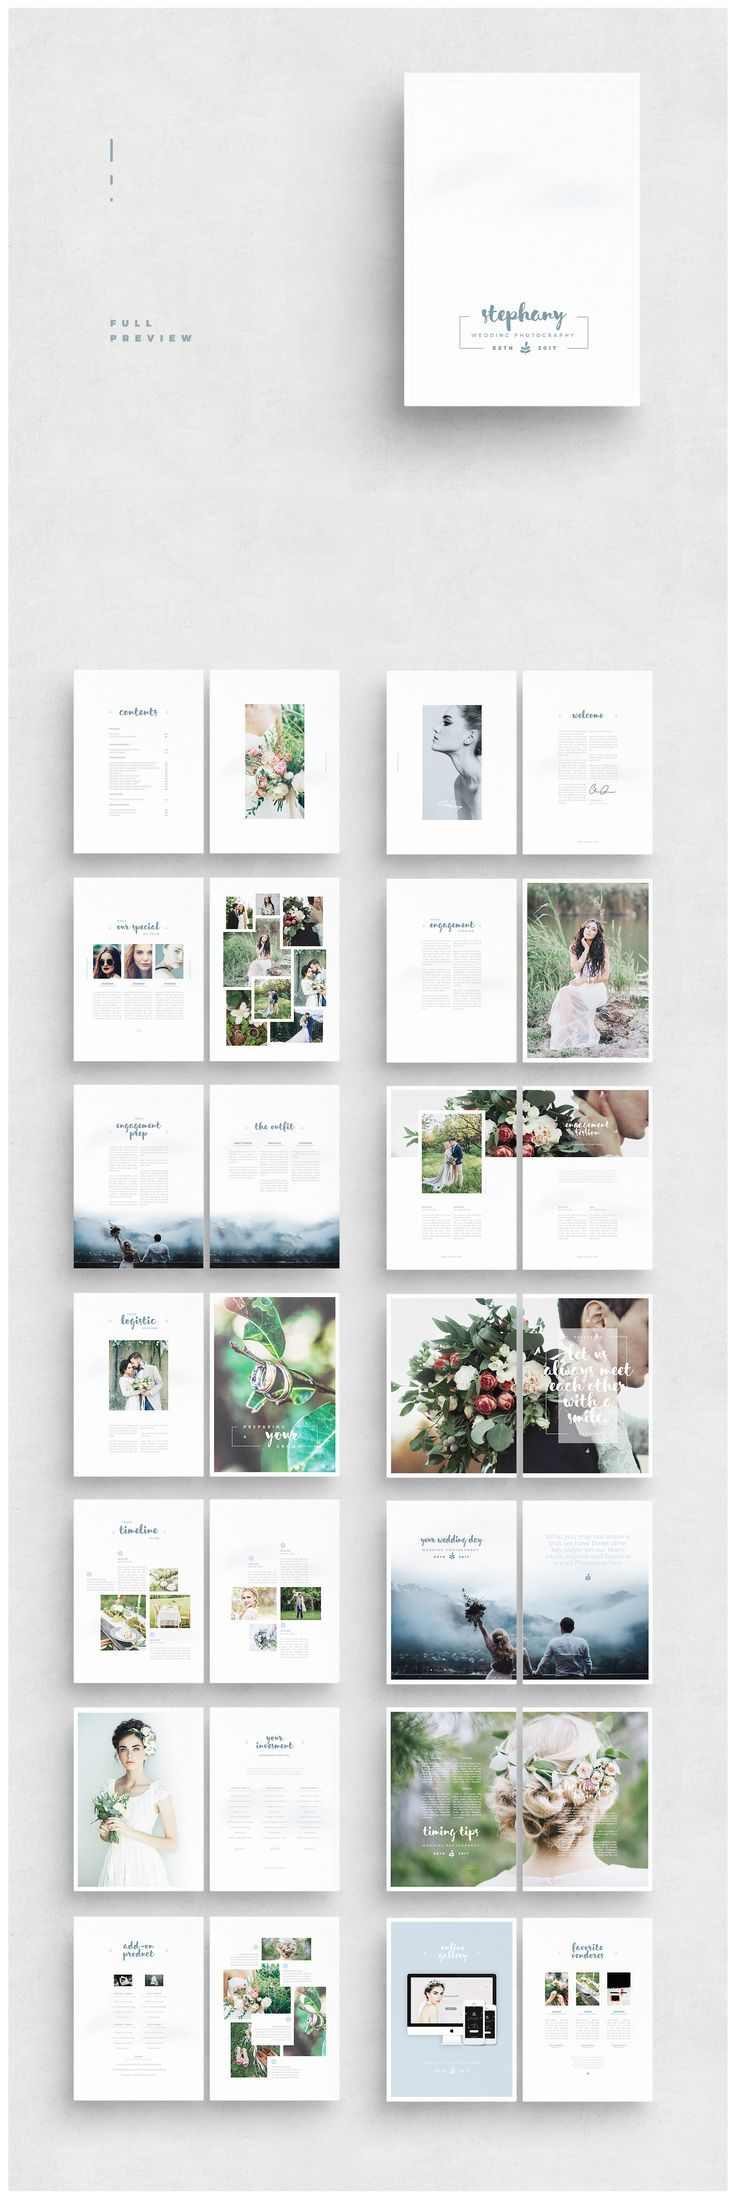 PHOTOGRAPHY PHOTO MARKETING PHOTOGRAPHER TEMPLATE MARKETING WEDDING TEMPLATES PR…